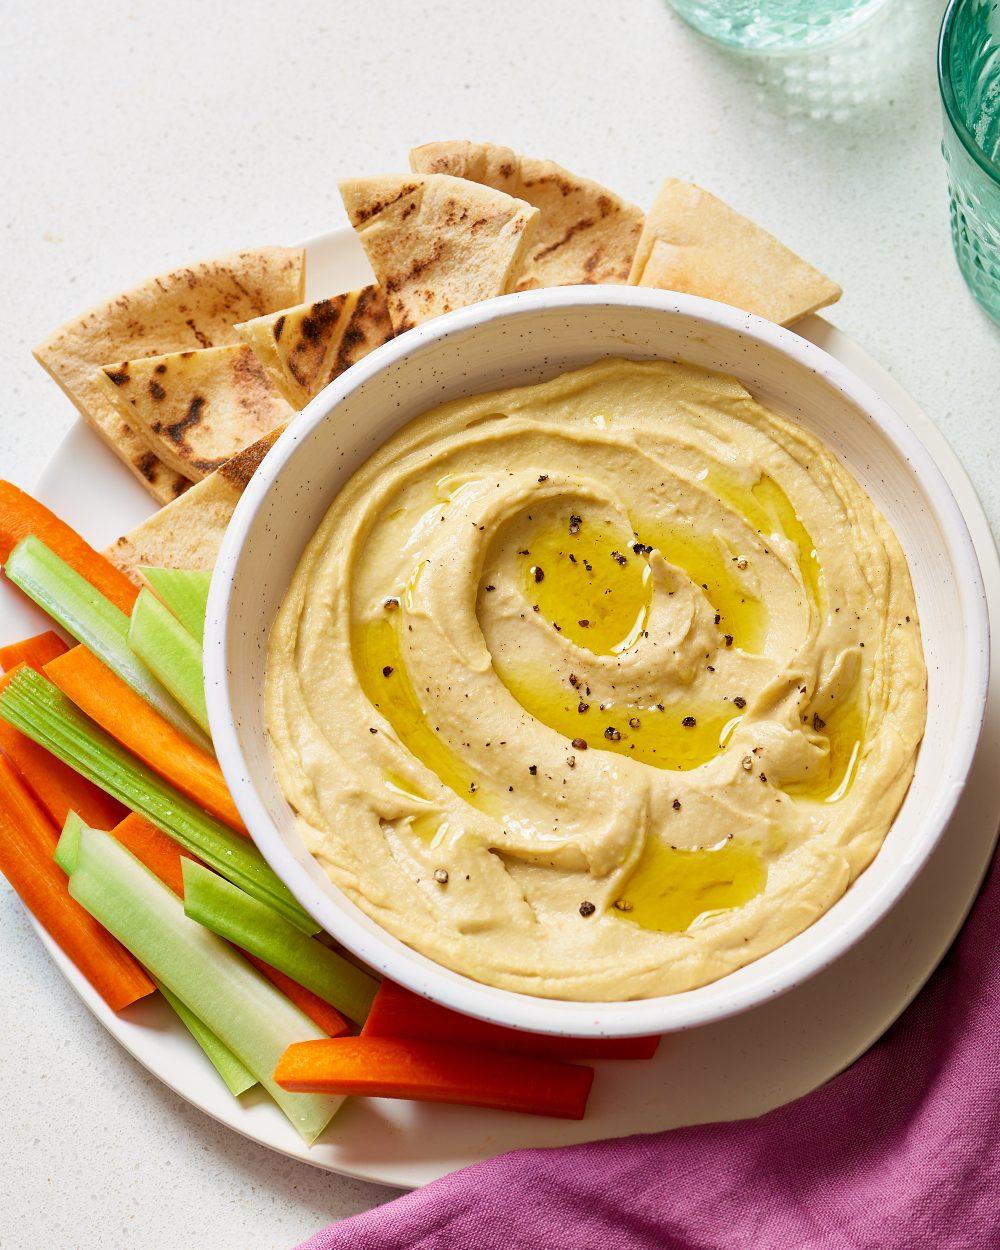 Zdravi namaz humus